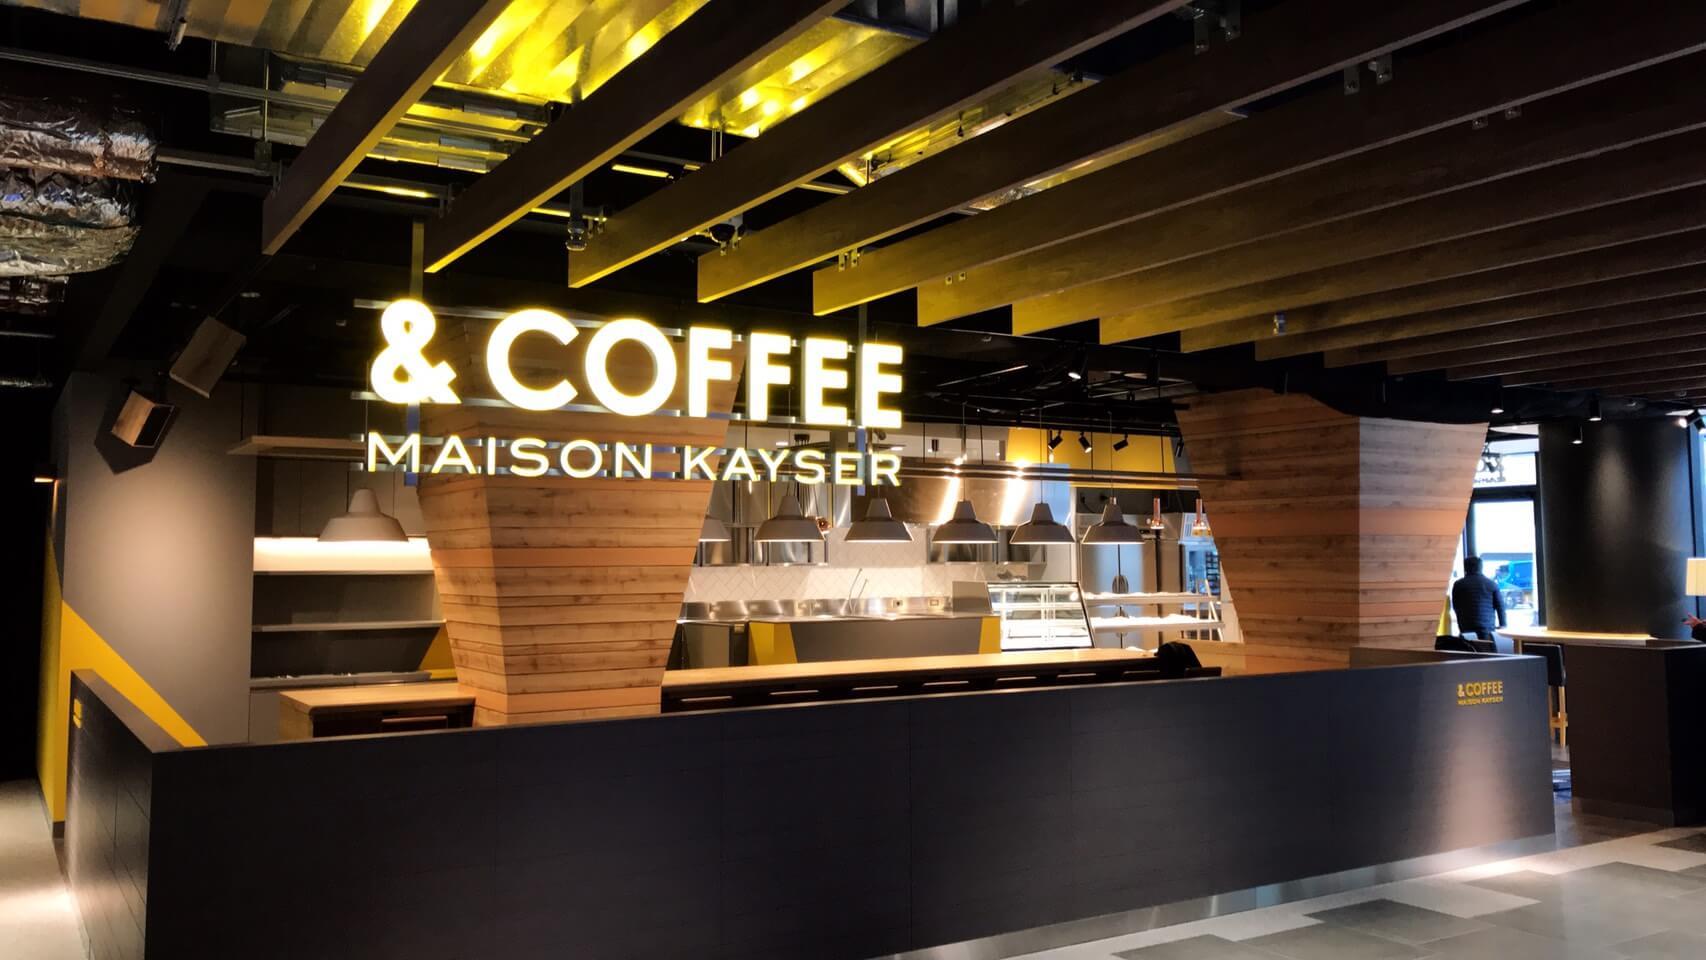 %ef%bc%86coffee-maison-kayser-suina%e5%ae%a4%e7%94%ba%e5%ba%97